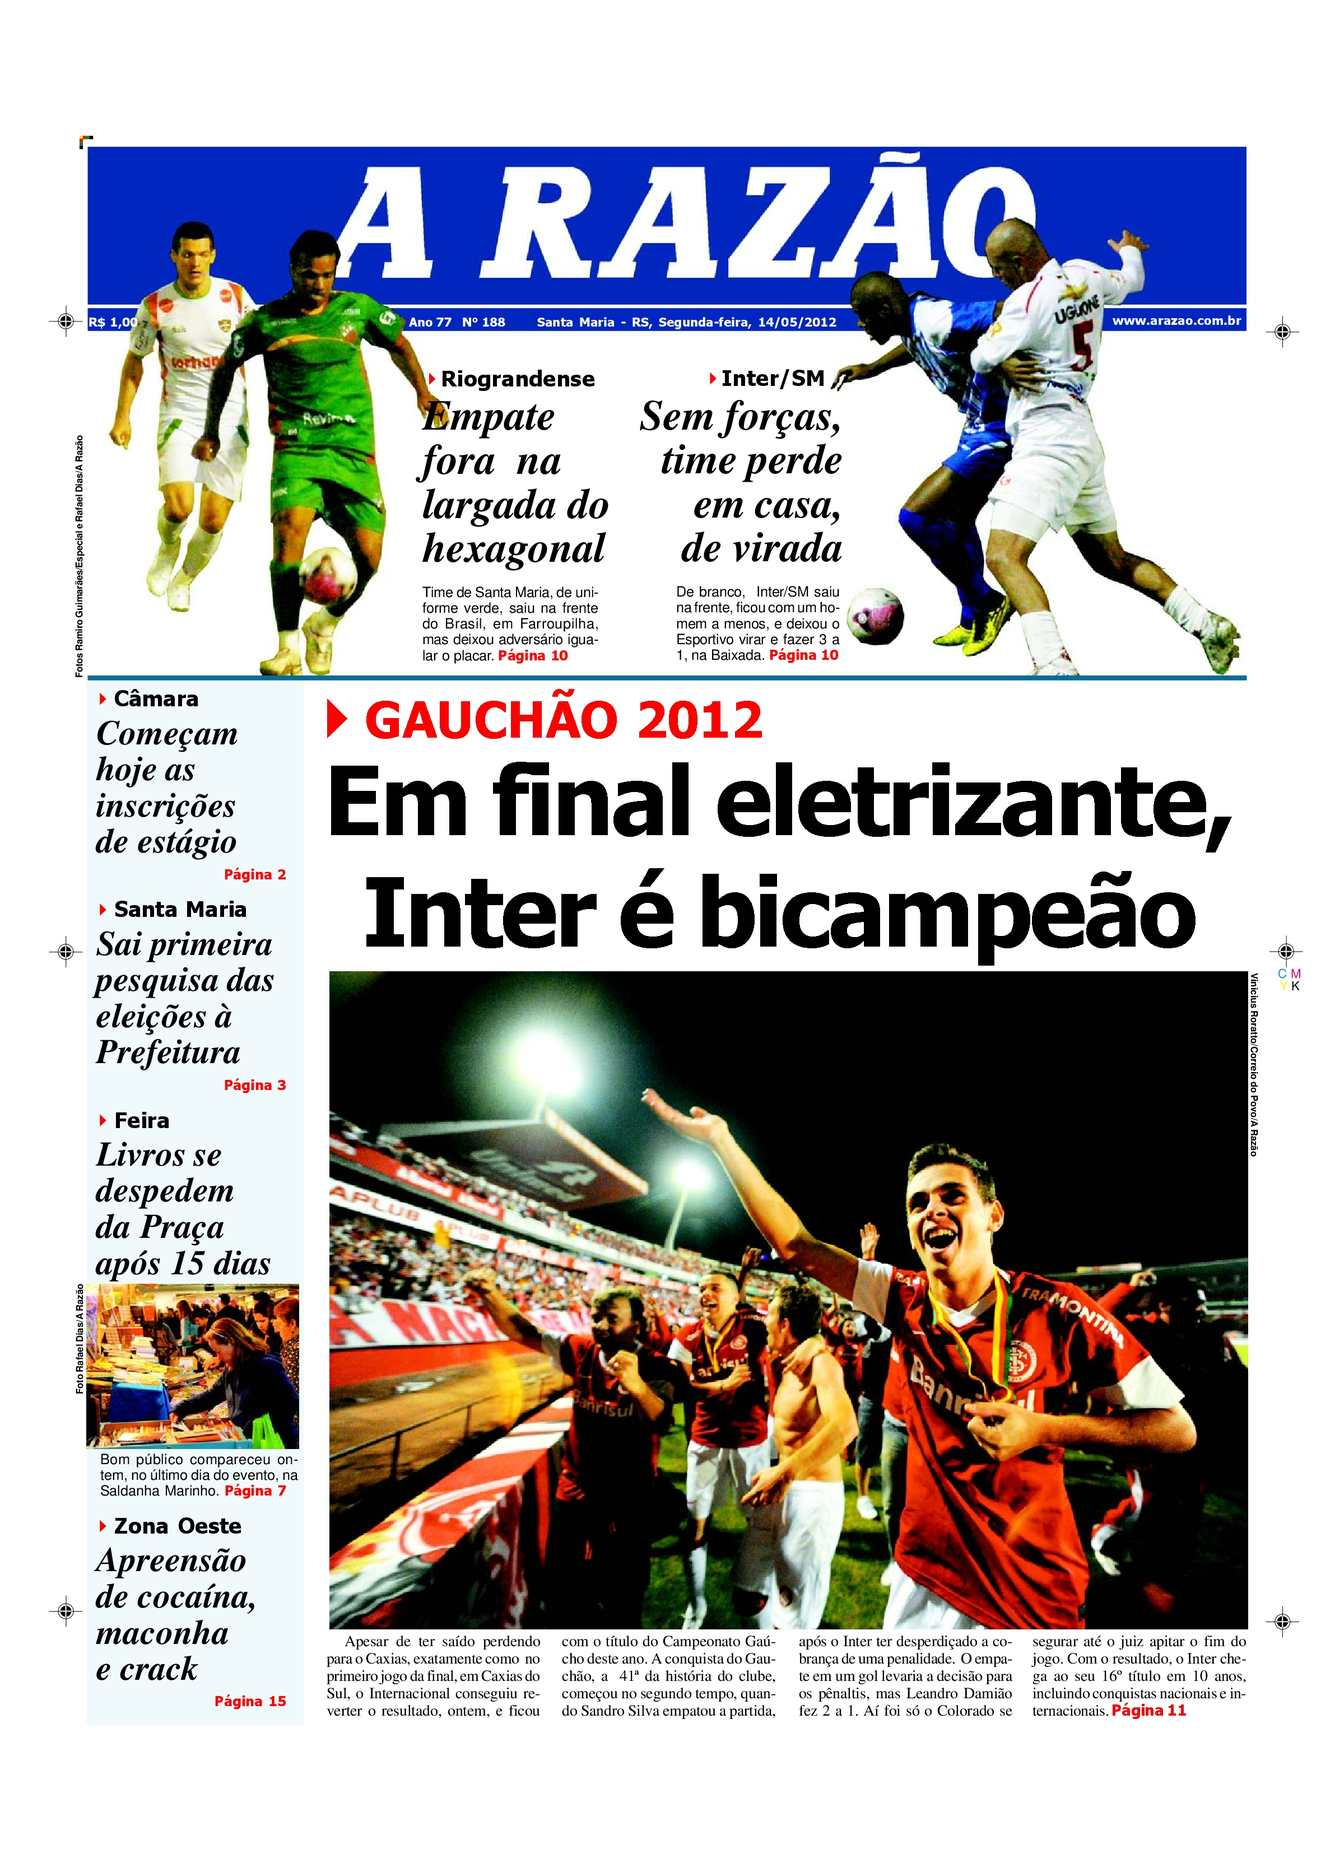 Calaméo - Jornal A Razão Santa Maria - 14052012 6ecdcea68f39b